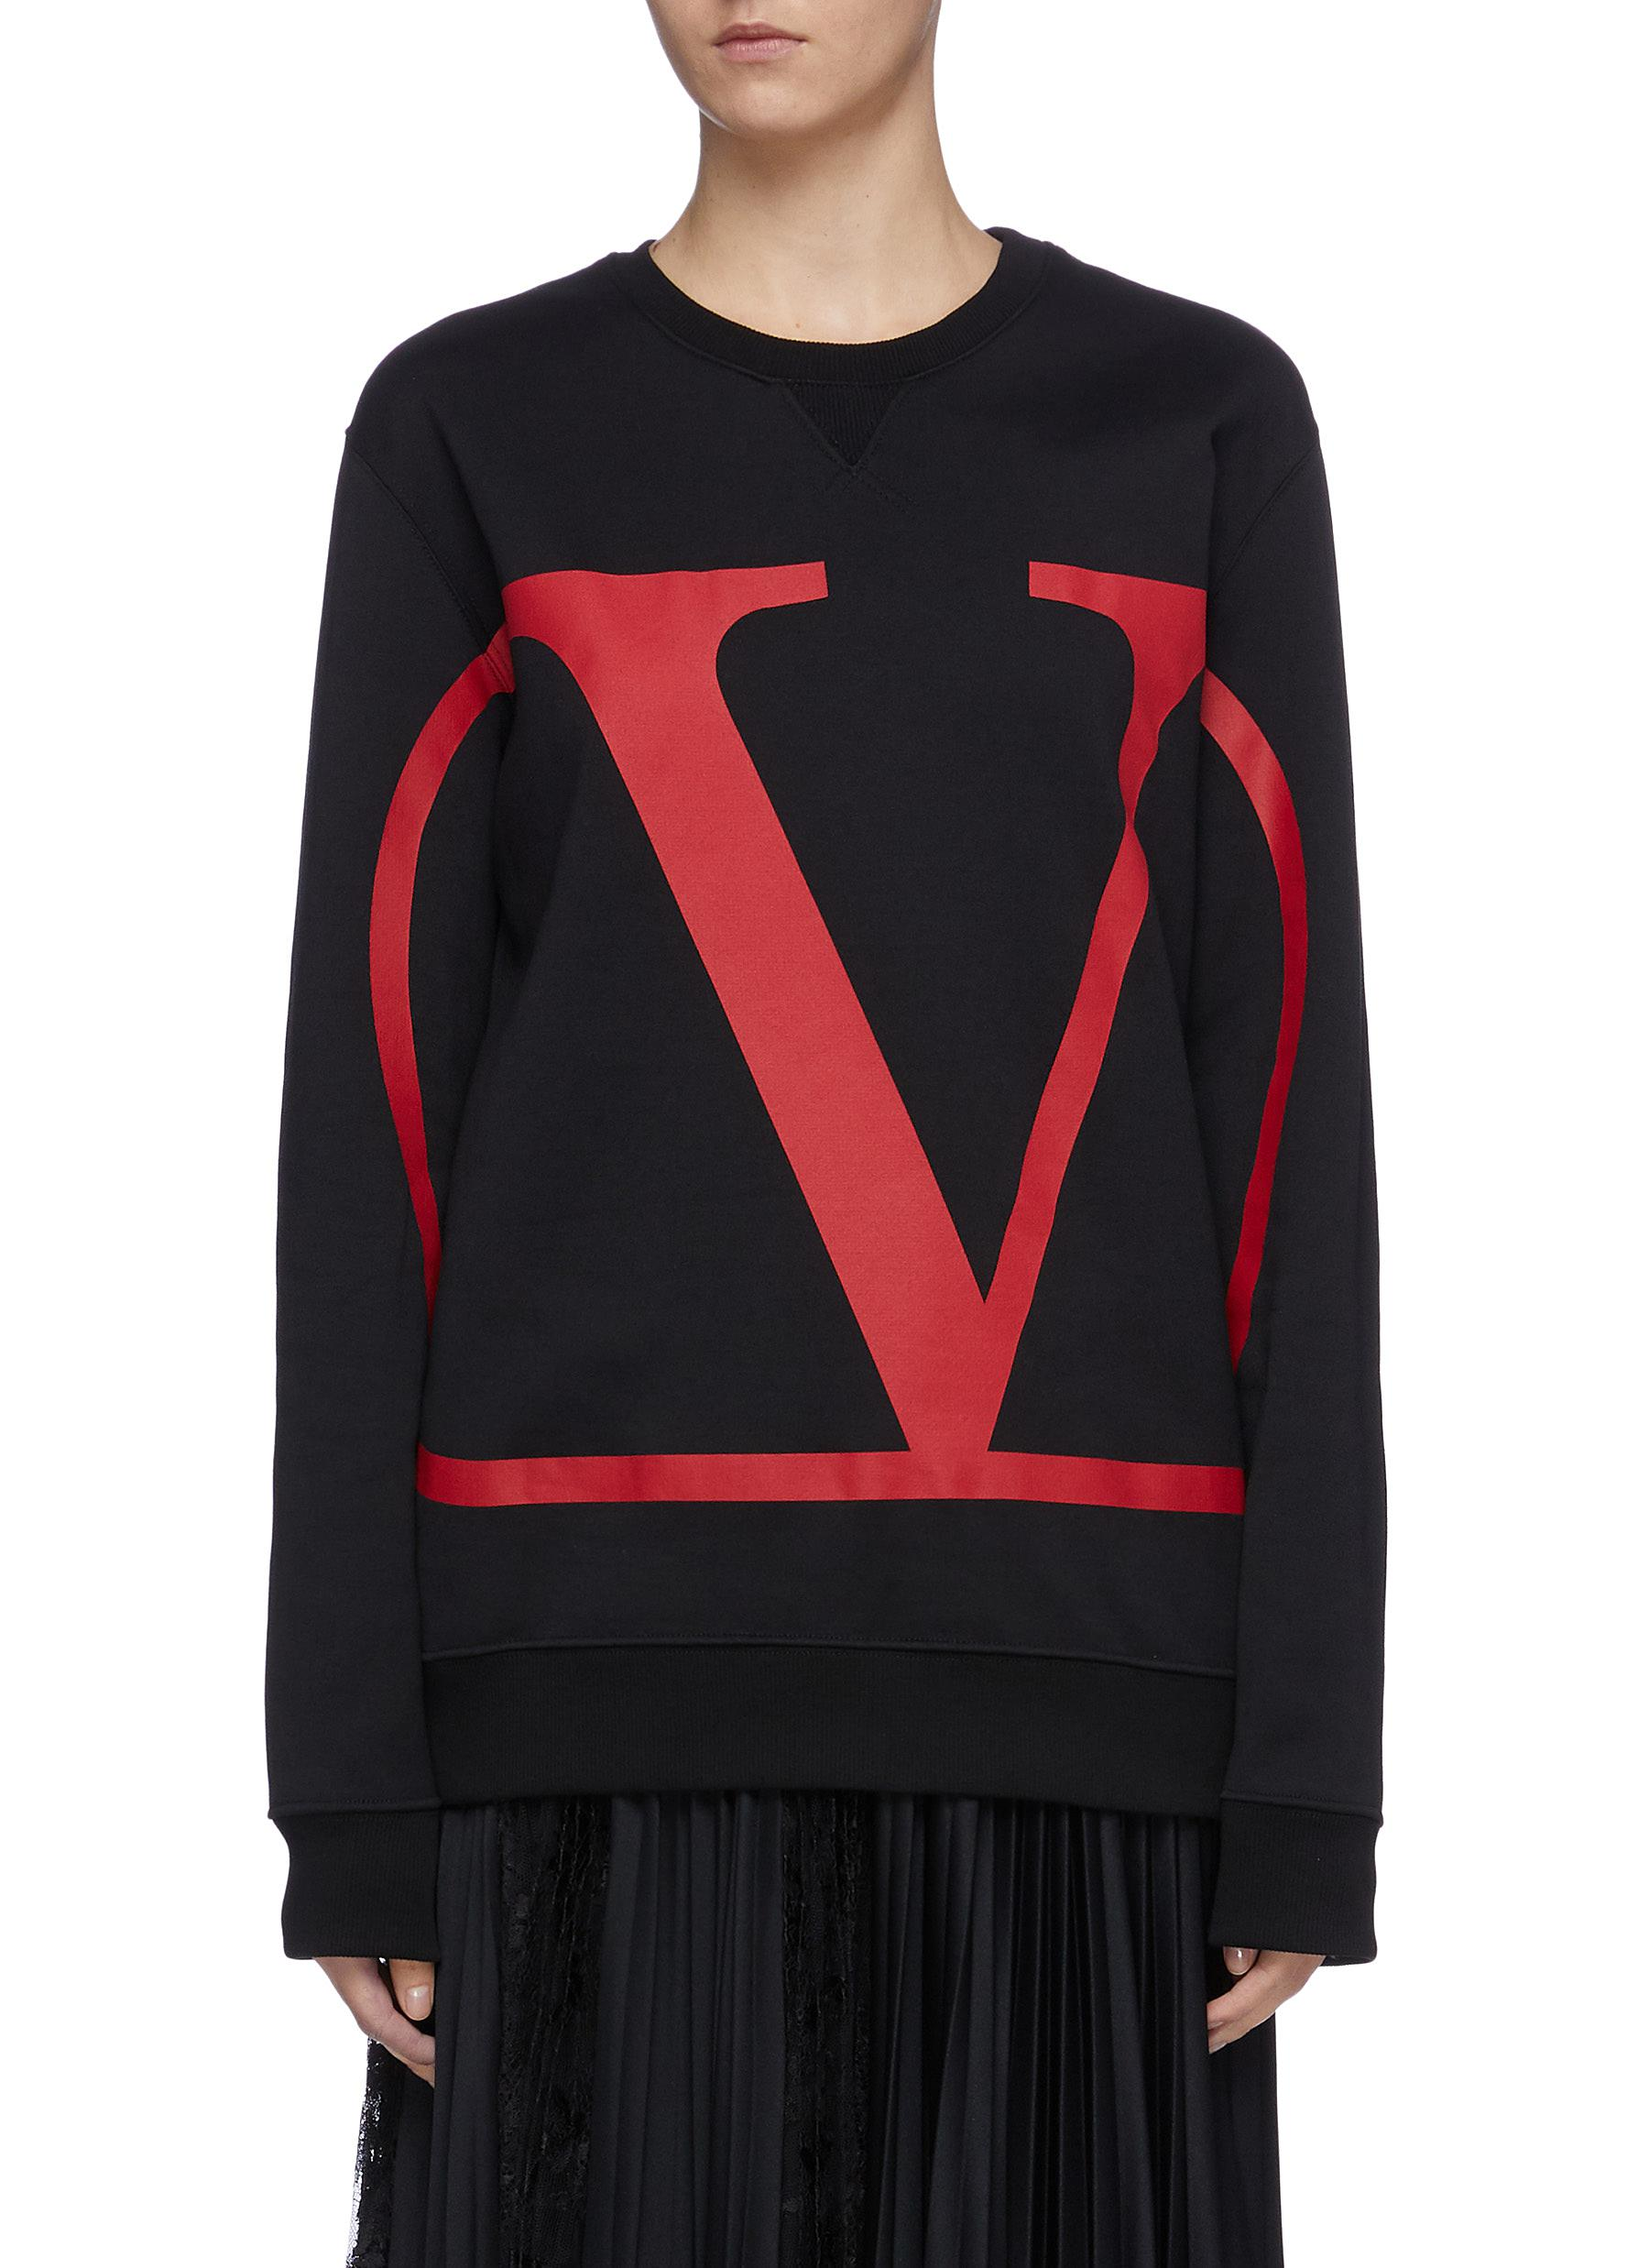 VLOGO print sweatshirt by Valentino